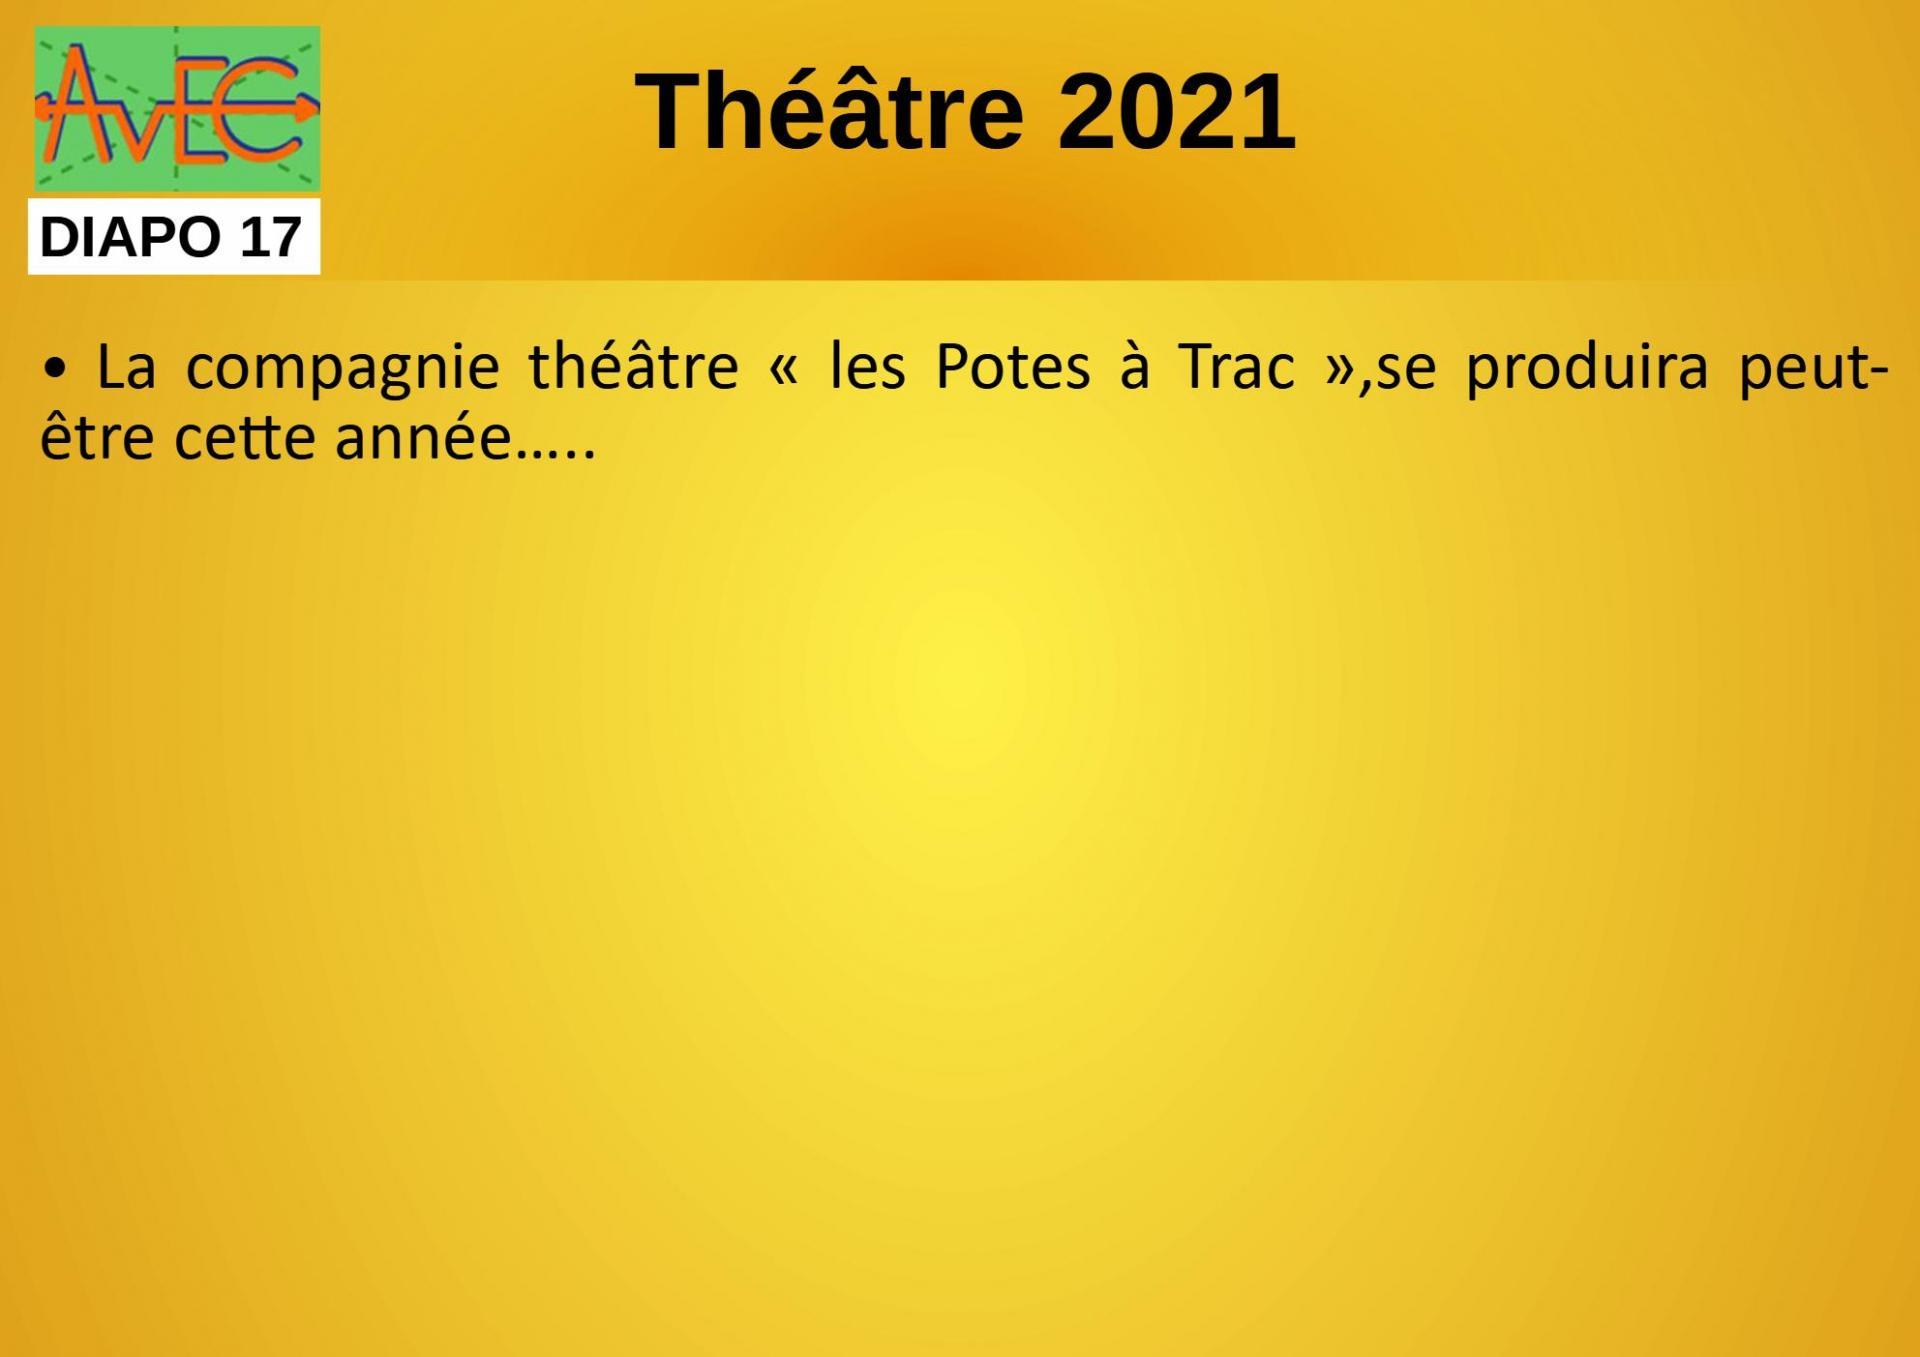 Diapo 17 Théâtre 2021